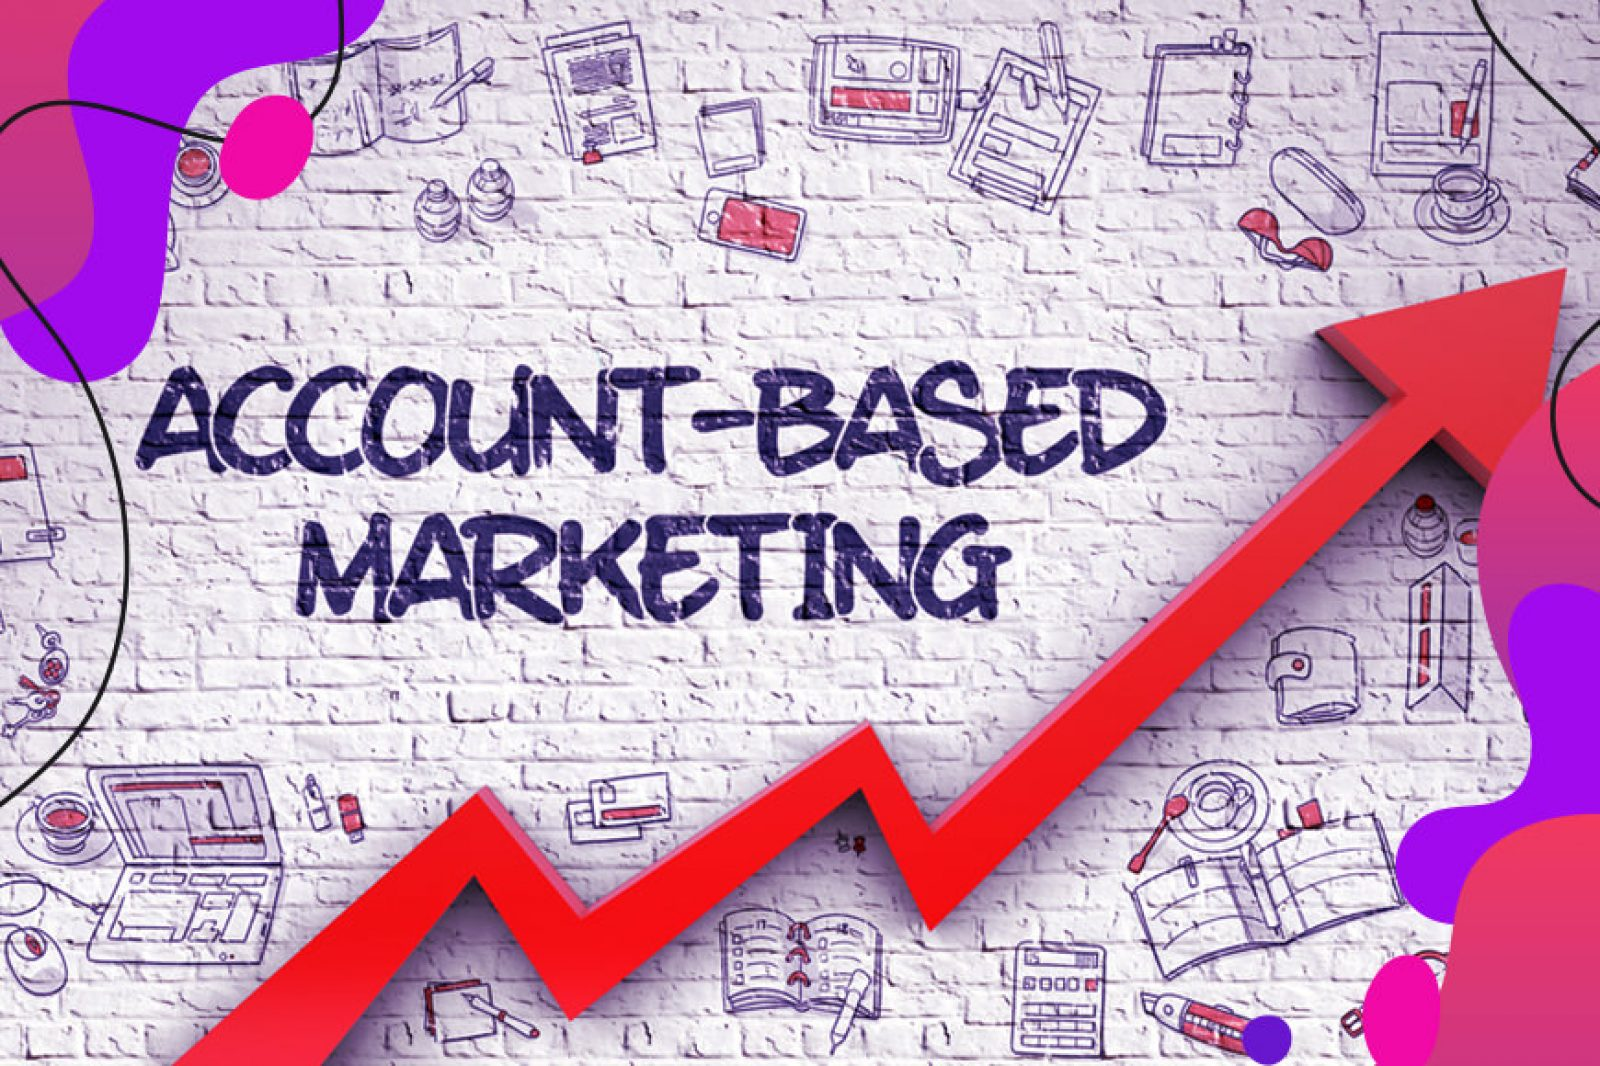 7 Winning Strategies for Account-Based Marketing